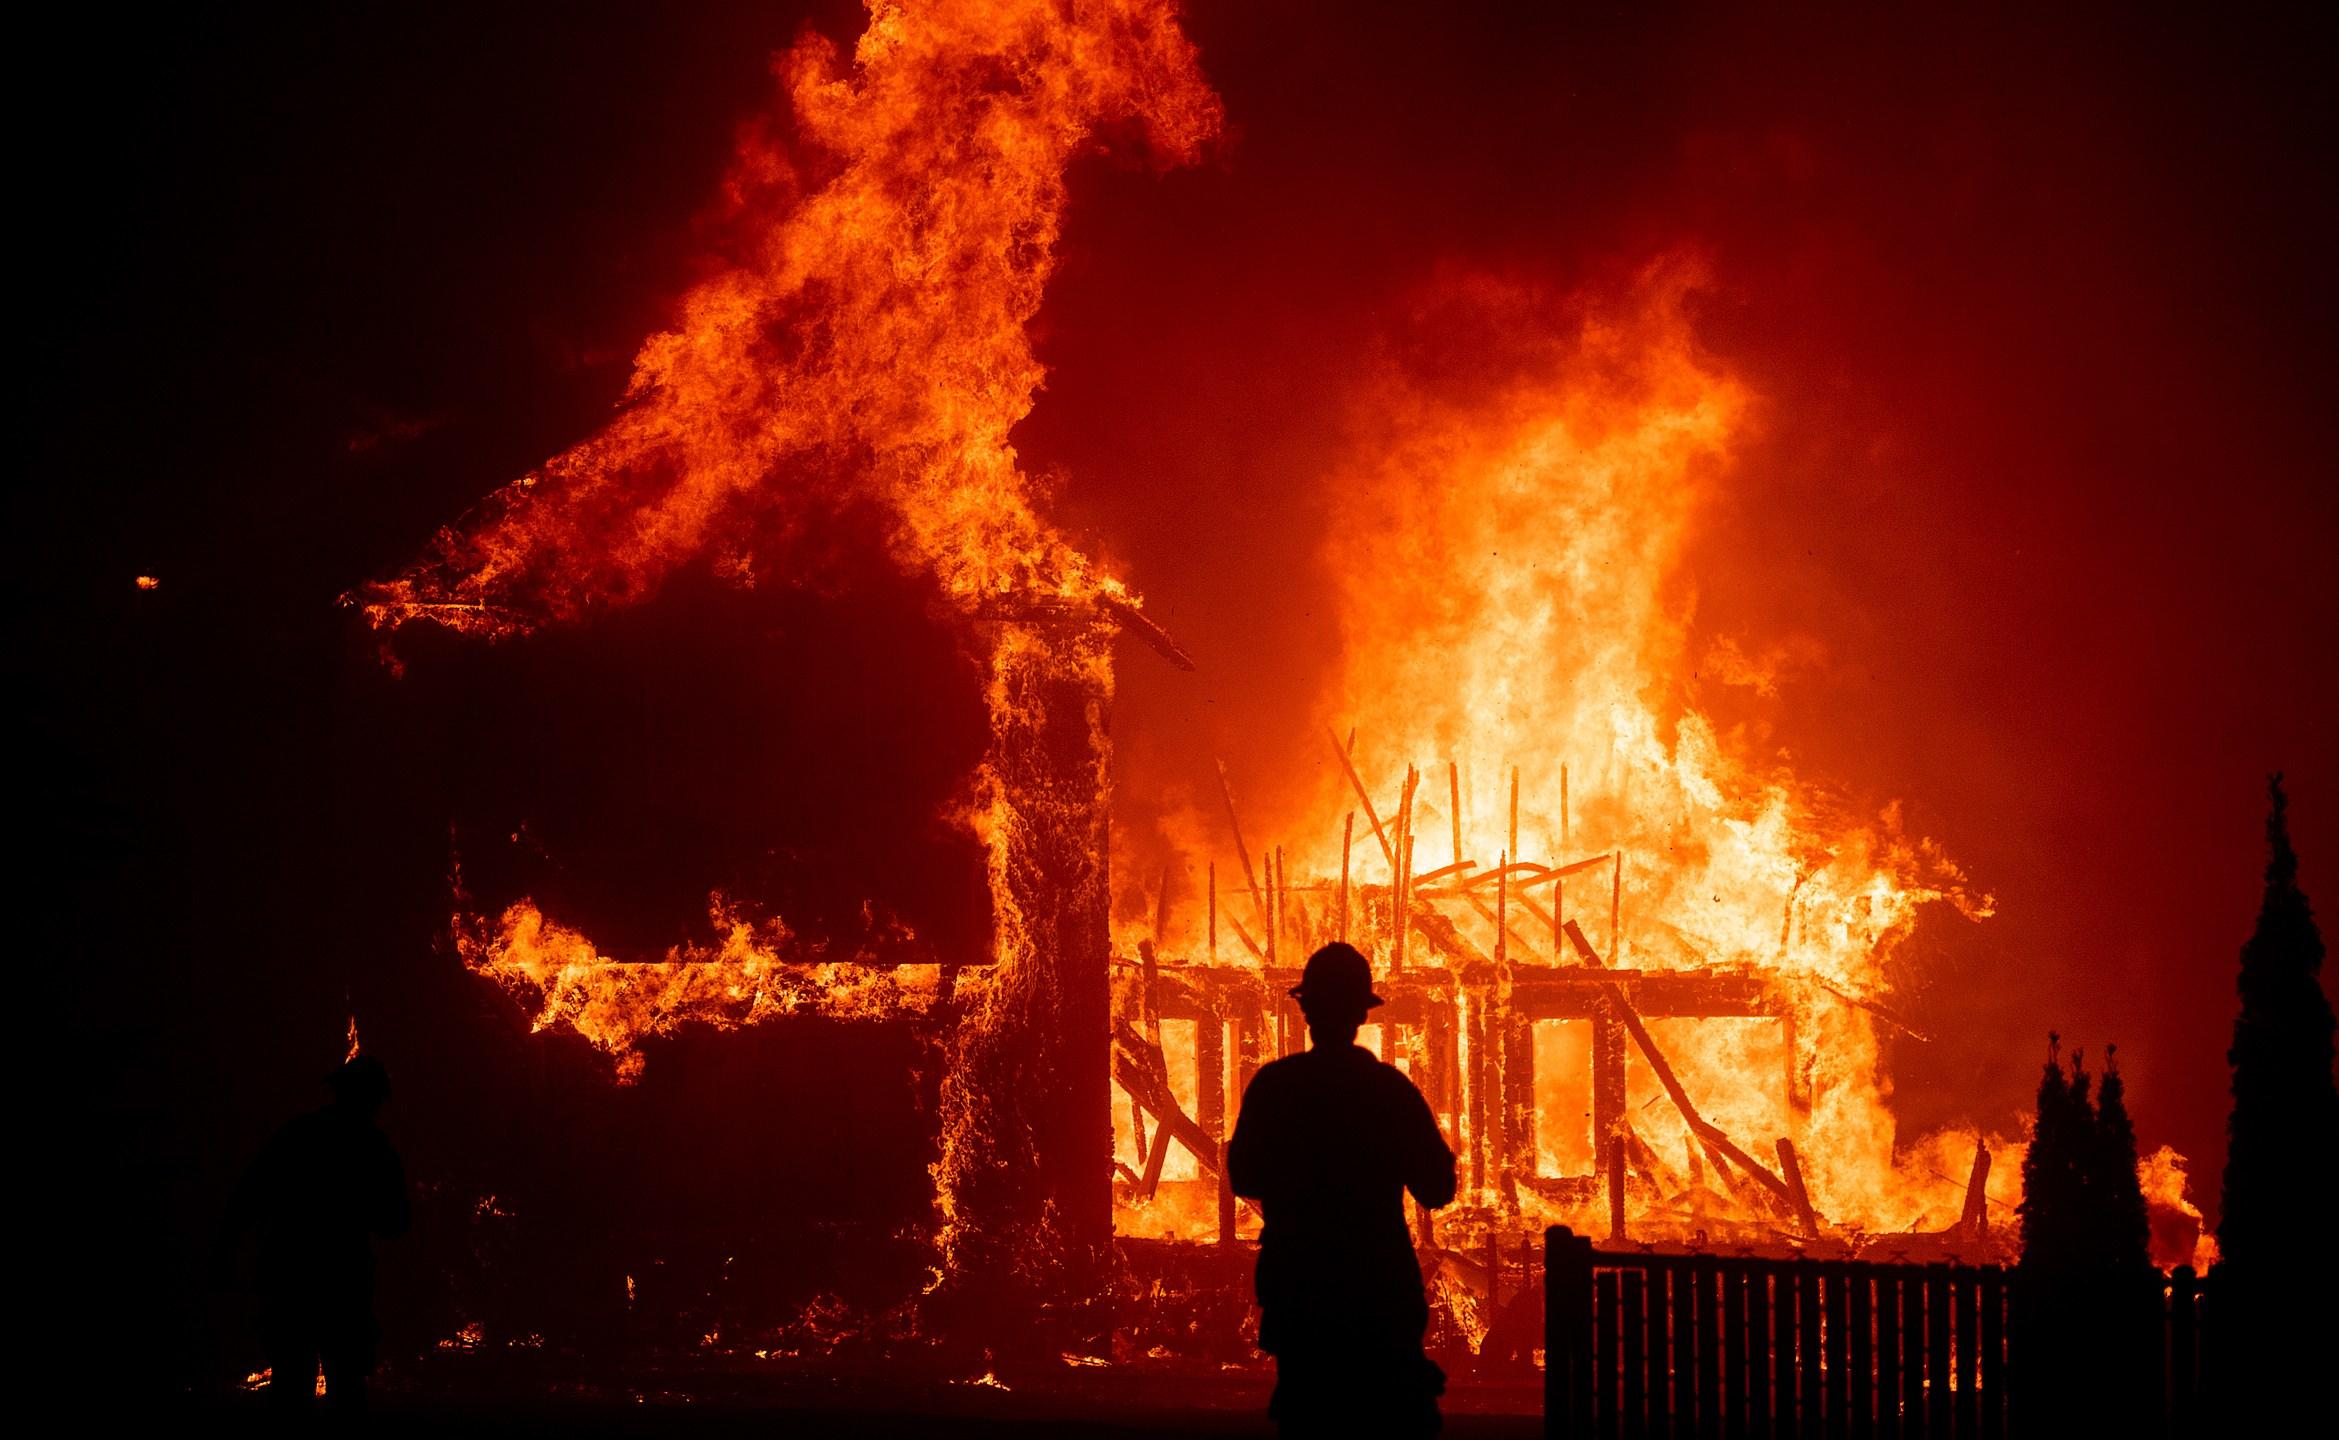 California_Wildfires_46386-159532.jpg20012980